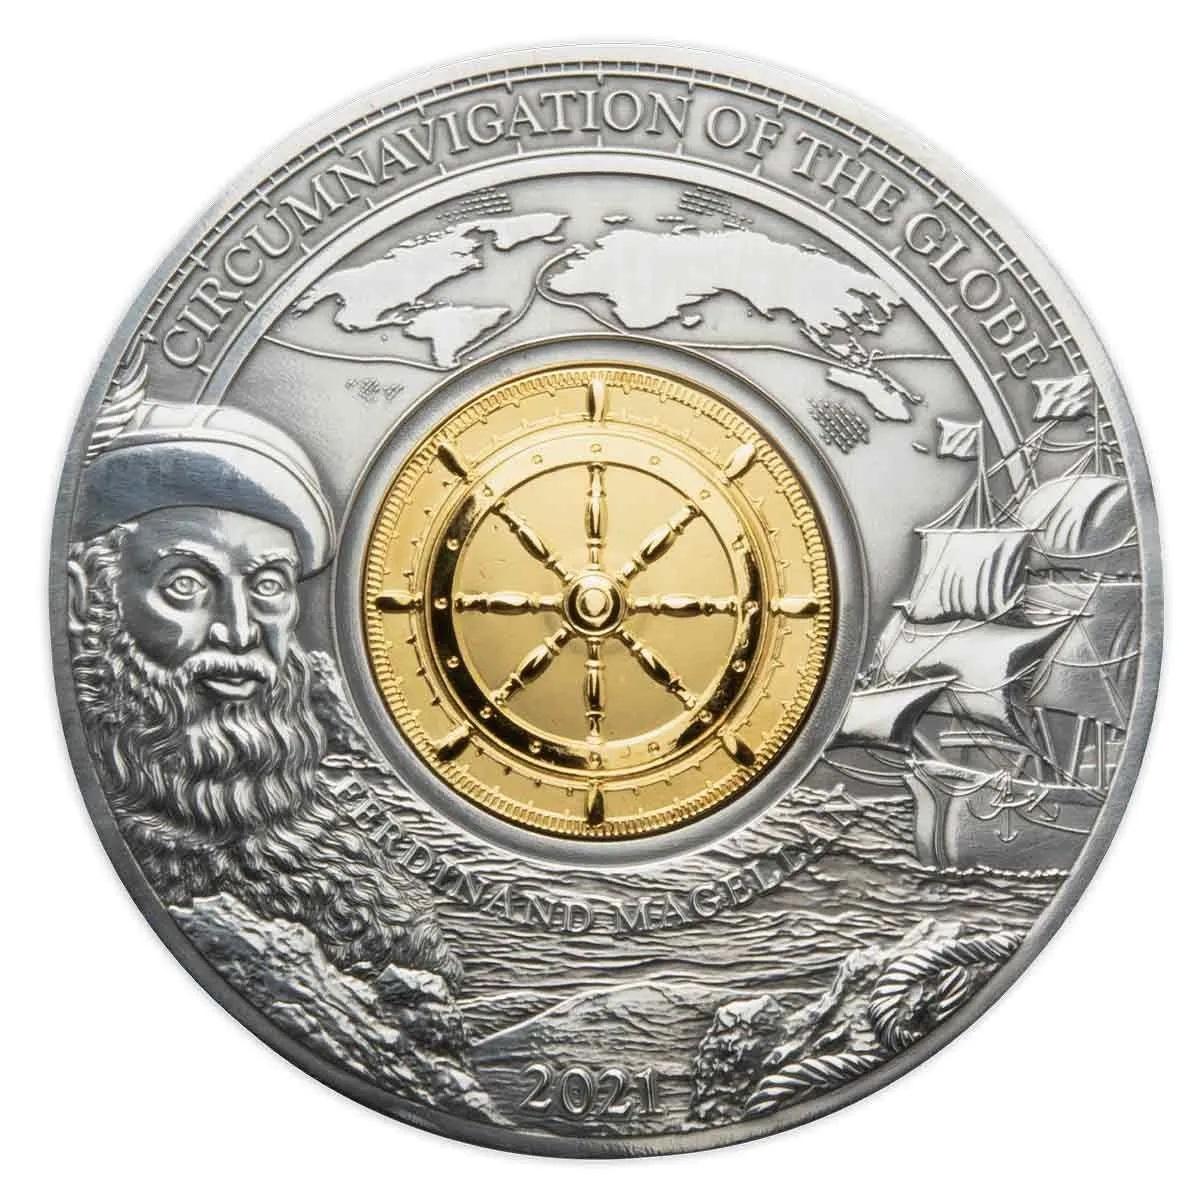 Барбадос монета 5 долларов Фердинанд Магеллан, реверс